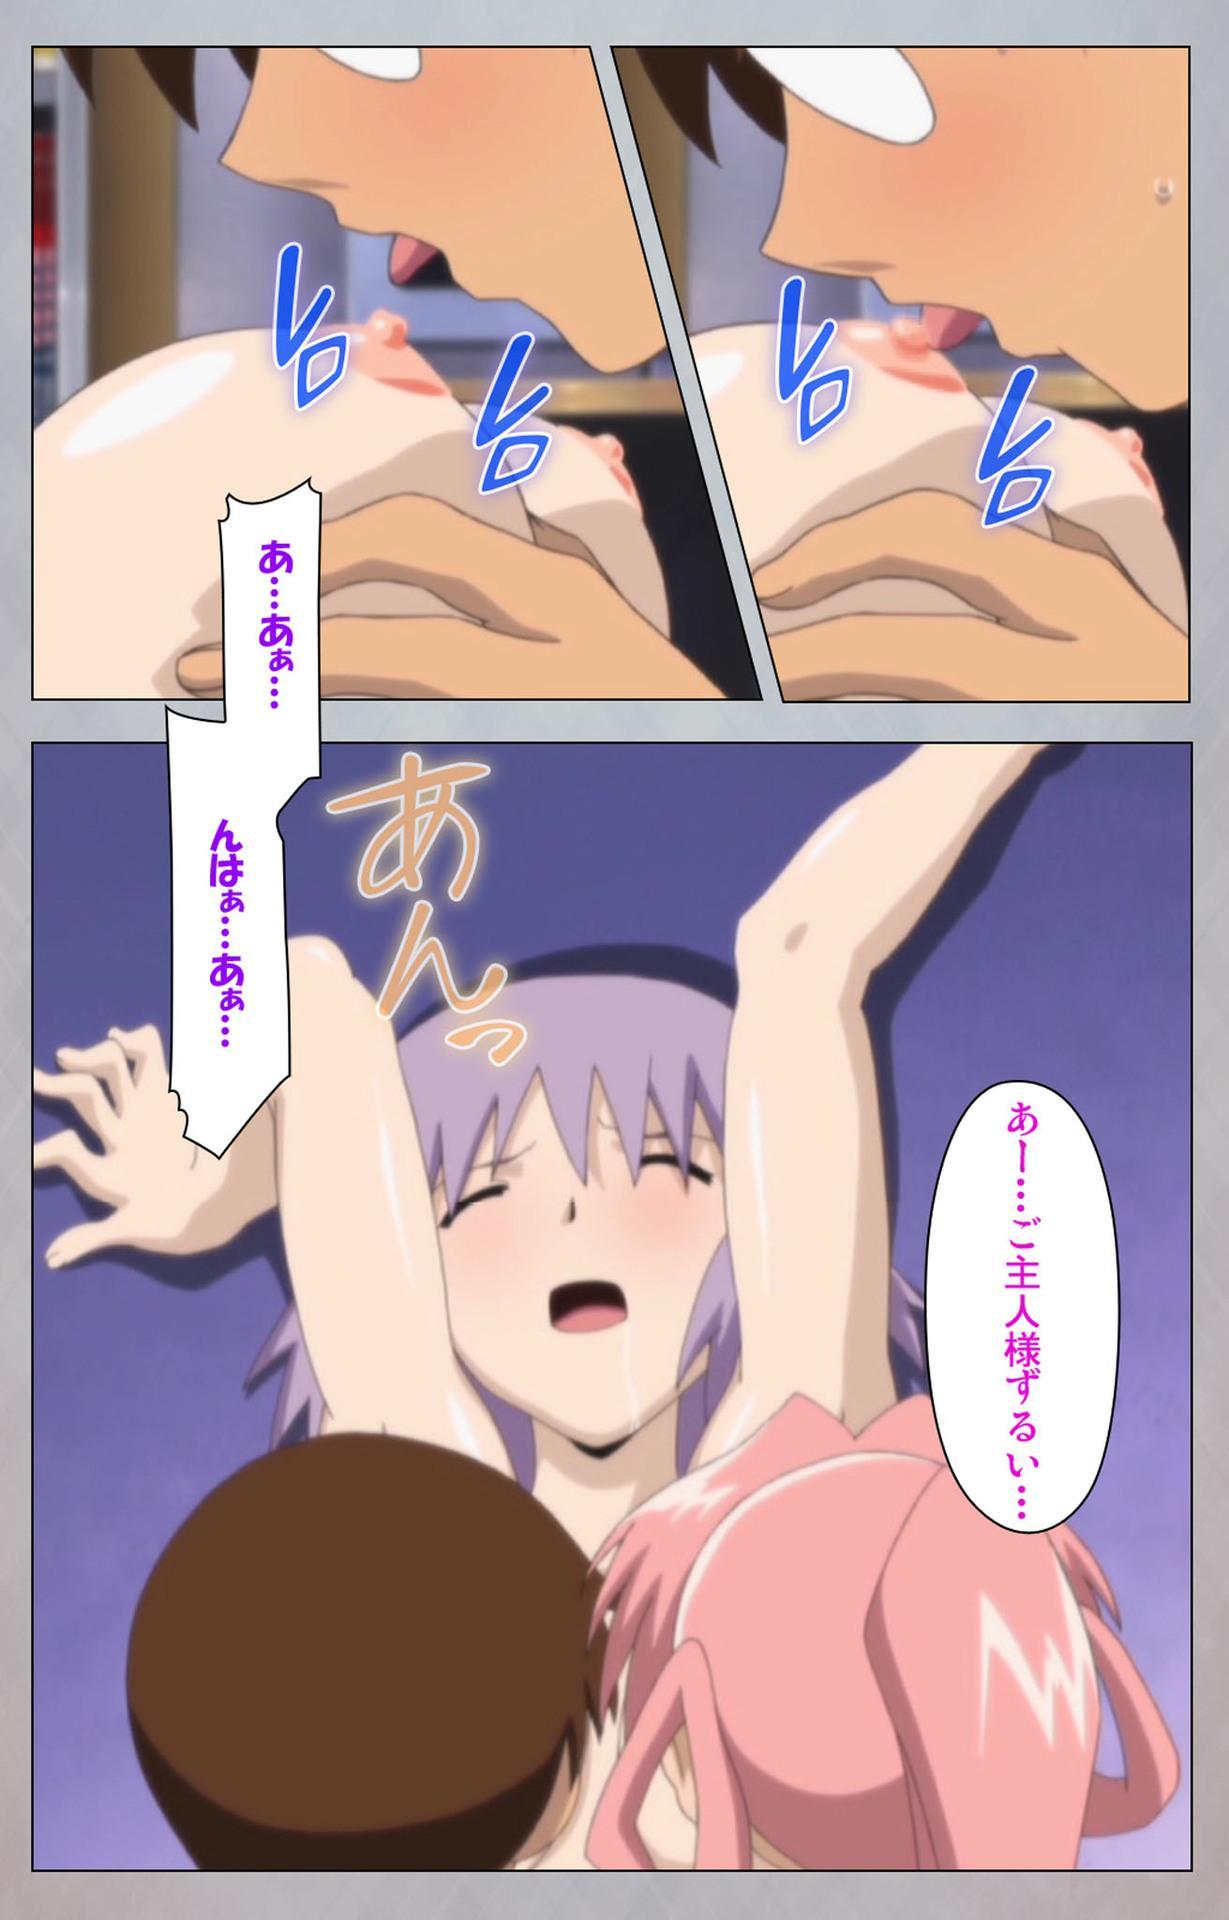 [Digital Works] [Full Color Seijin Ban] Sex Android ~Risou no Onna de Nuite yaru~ Kanzenban 212